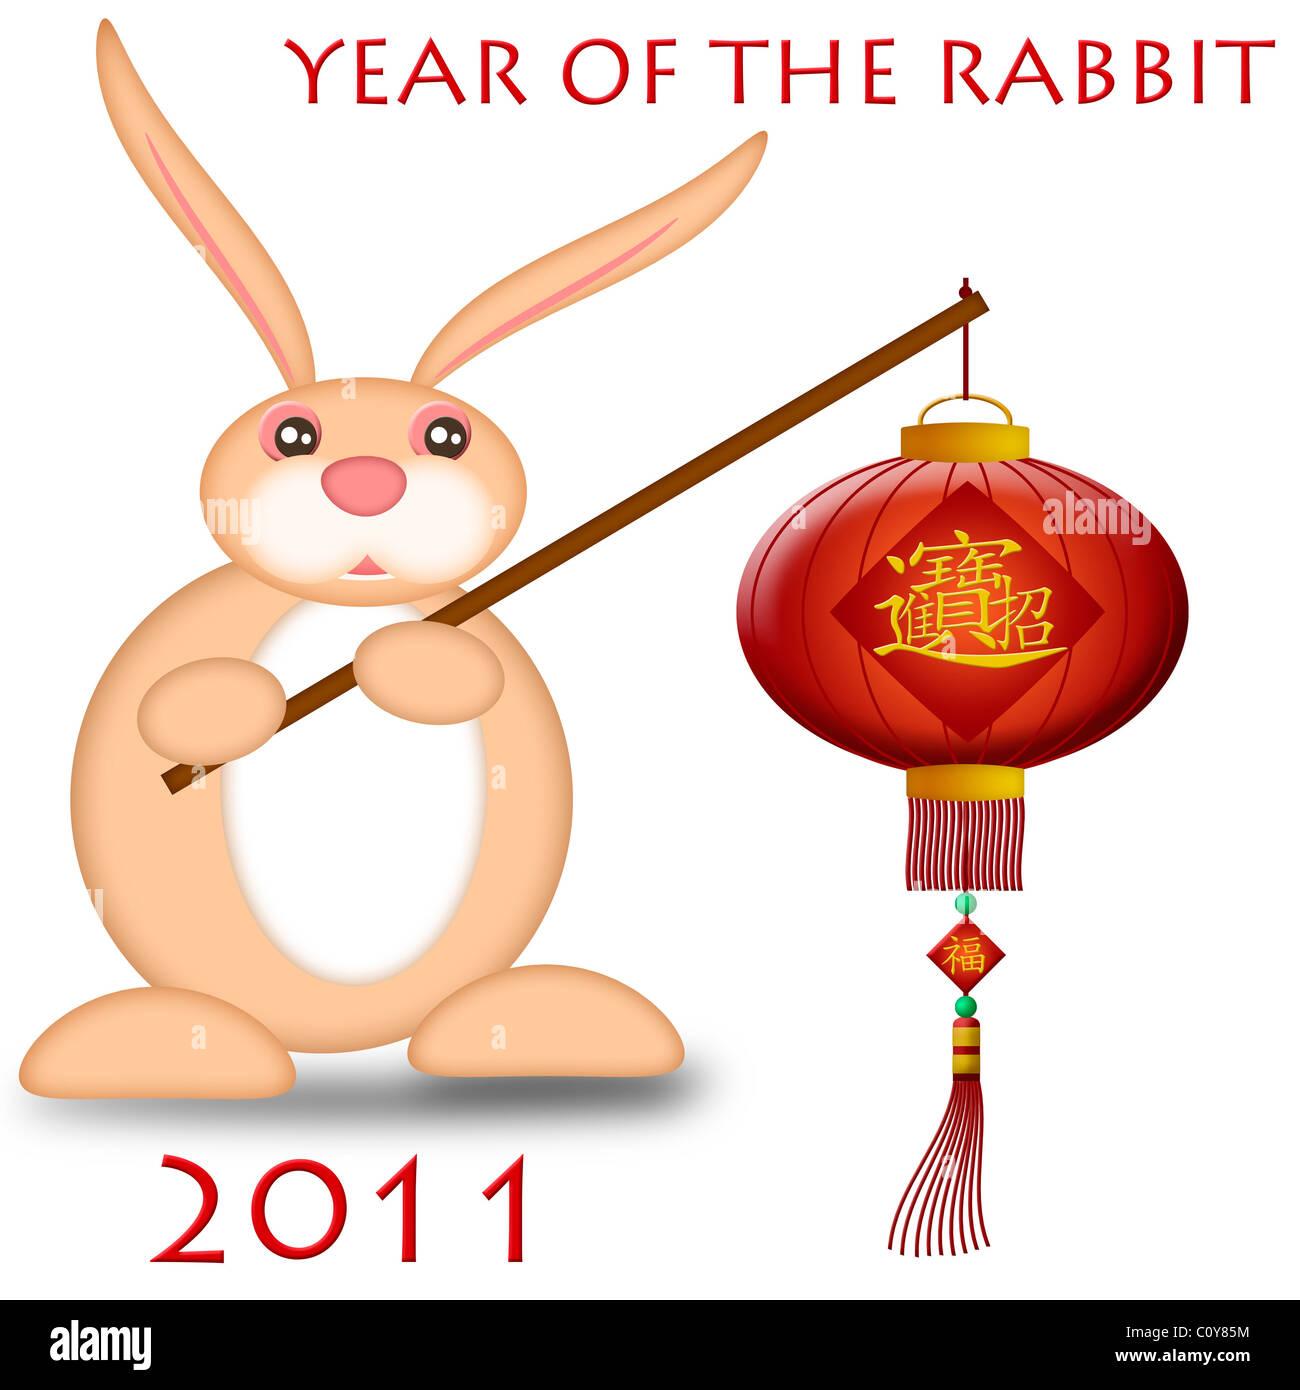 happy chinese new year 2011 rabbit holding lantern bokeh illustration - Chinese New Year 2011